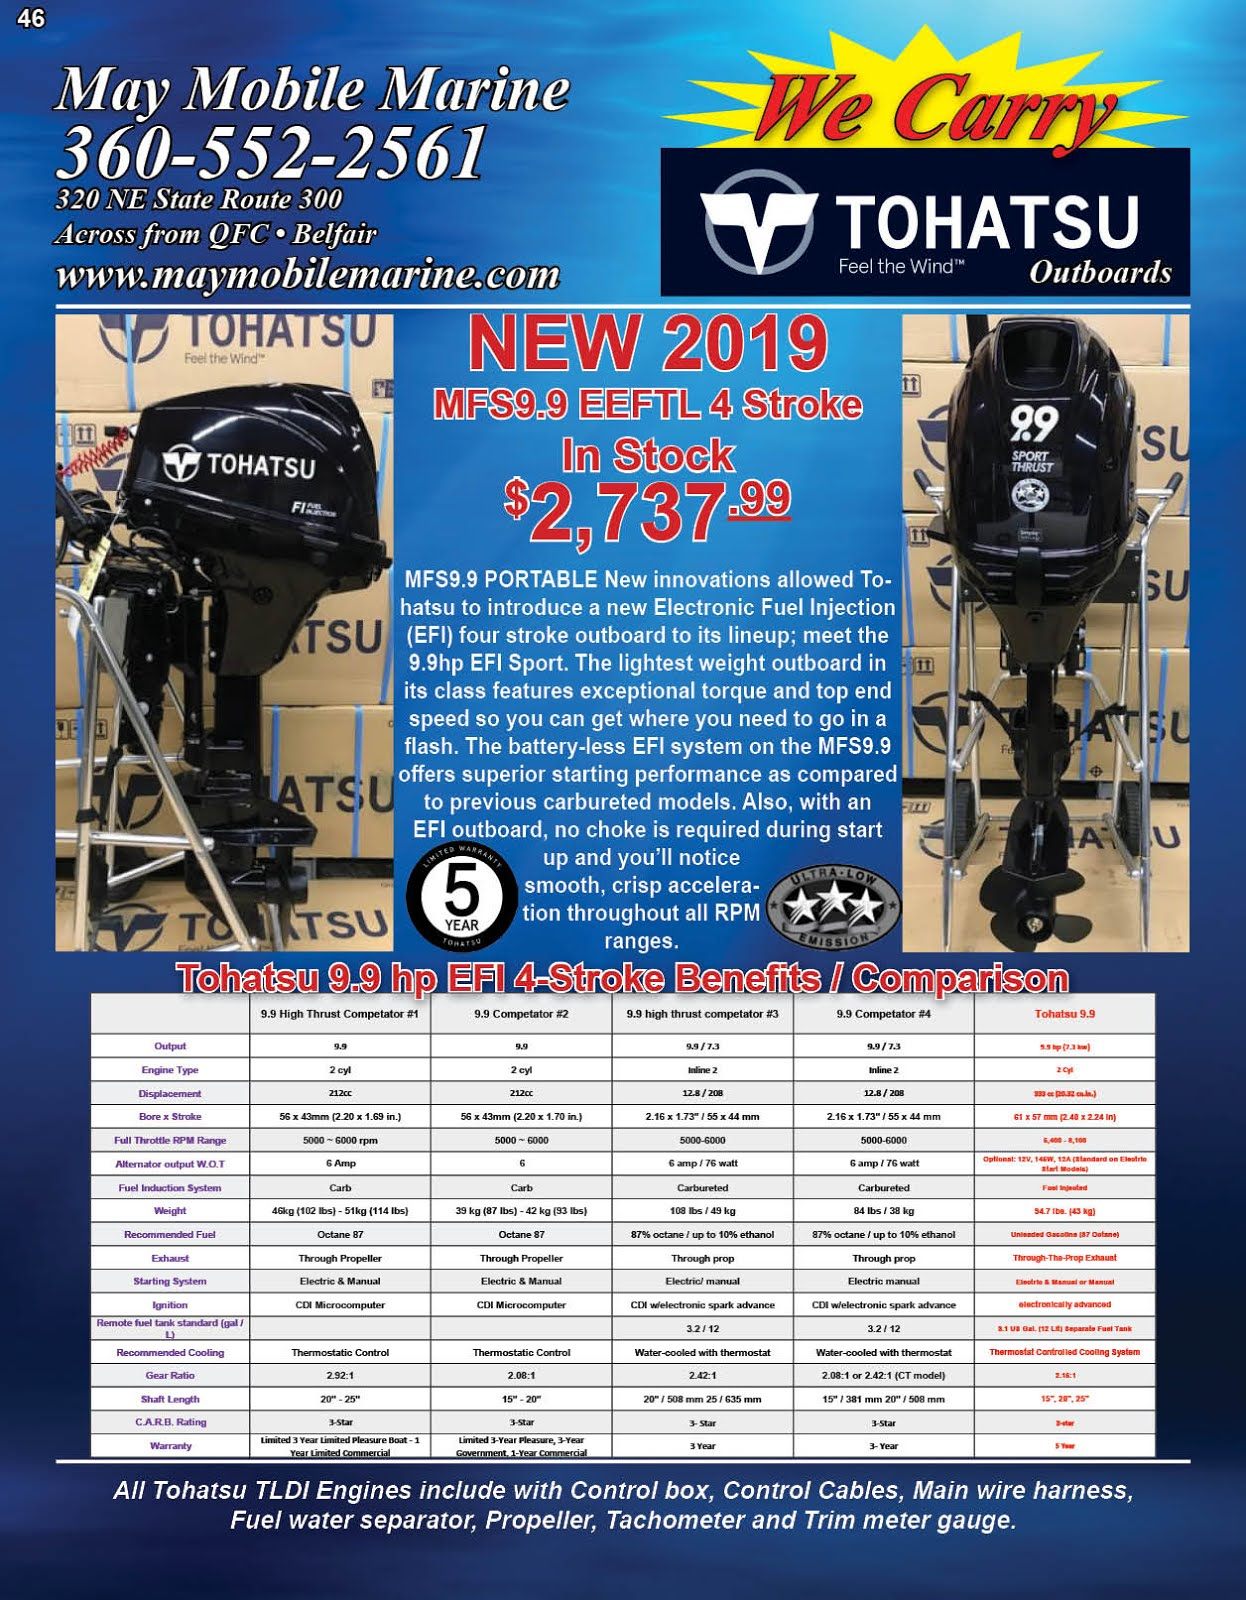 May Mobile Marine Tohatsu Outboard Motor Sale!!